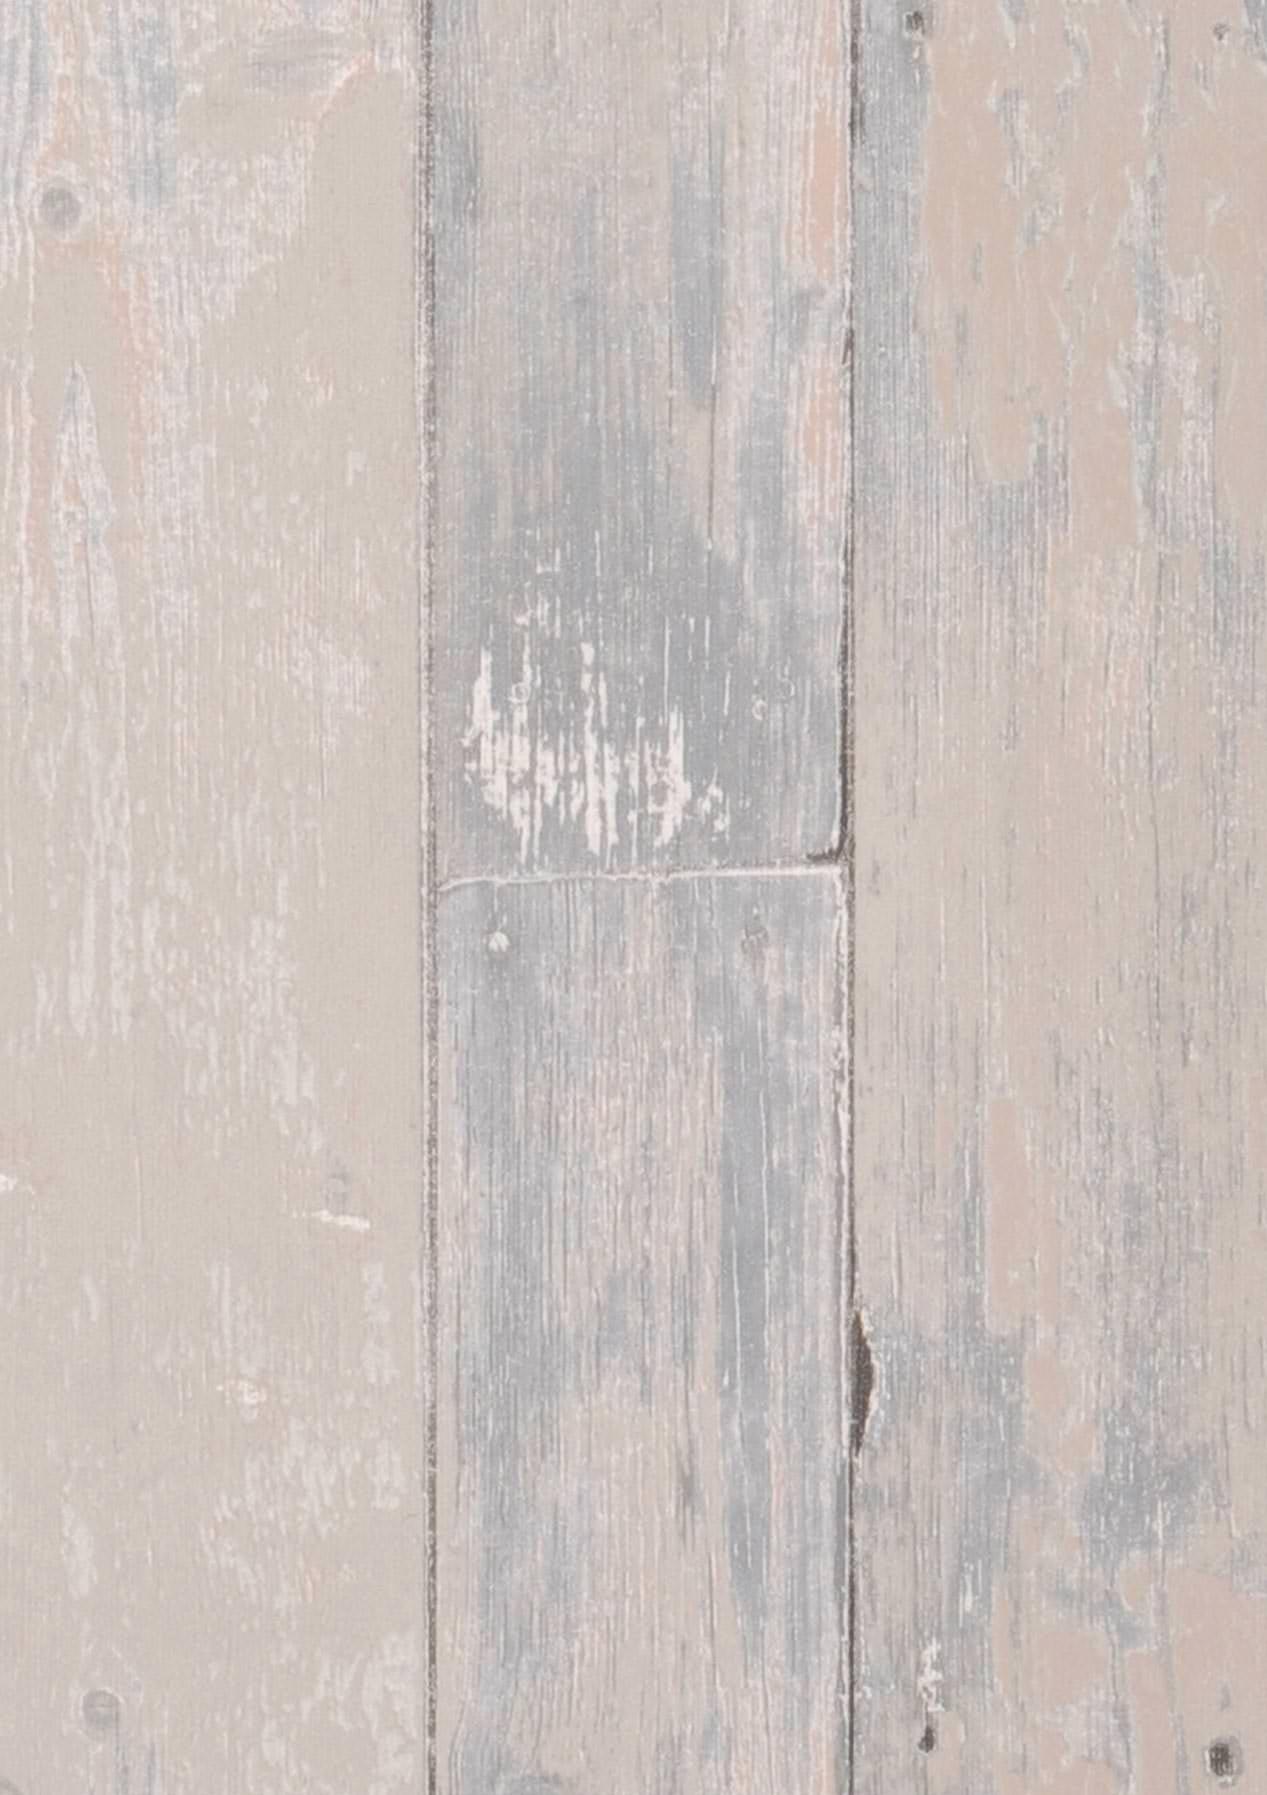 Tapete country wood basaltgrau blassbraun graubeige for Tapete nach hause